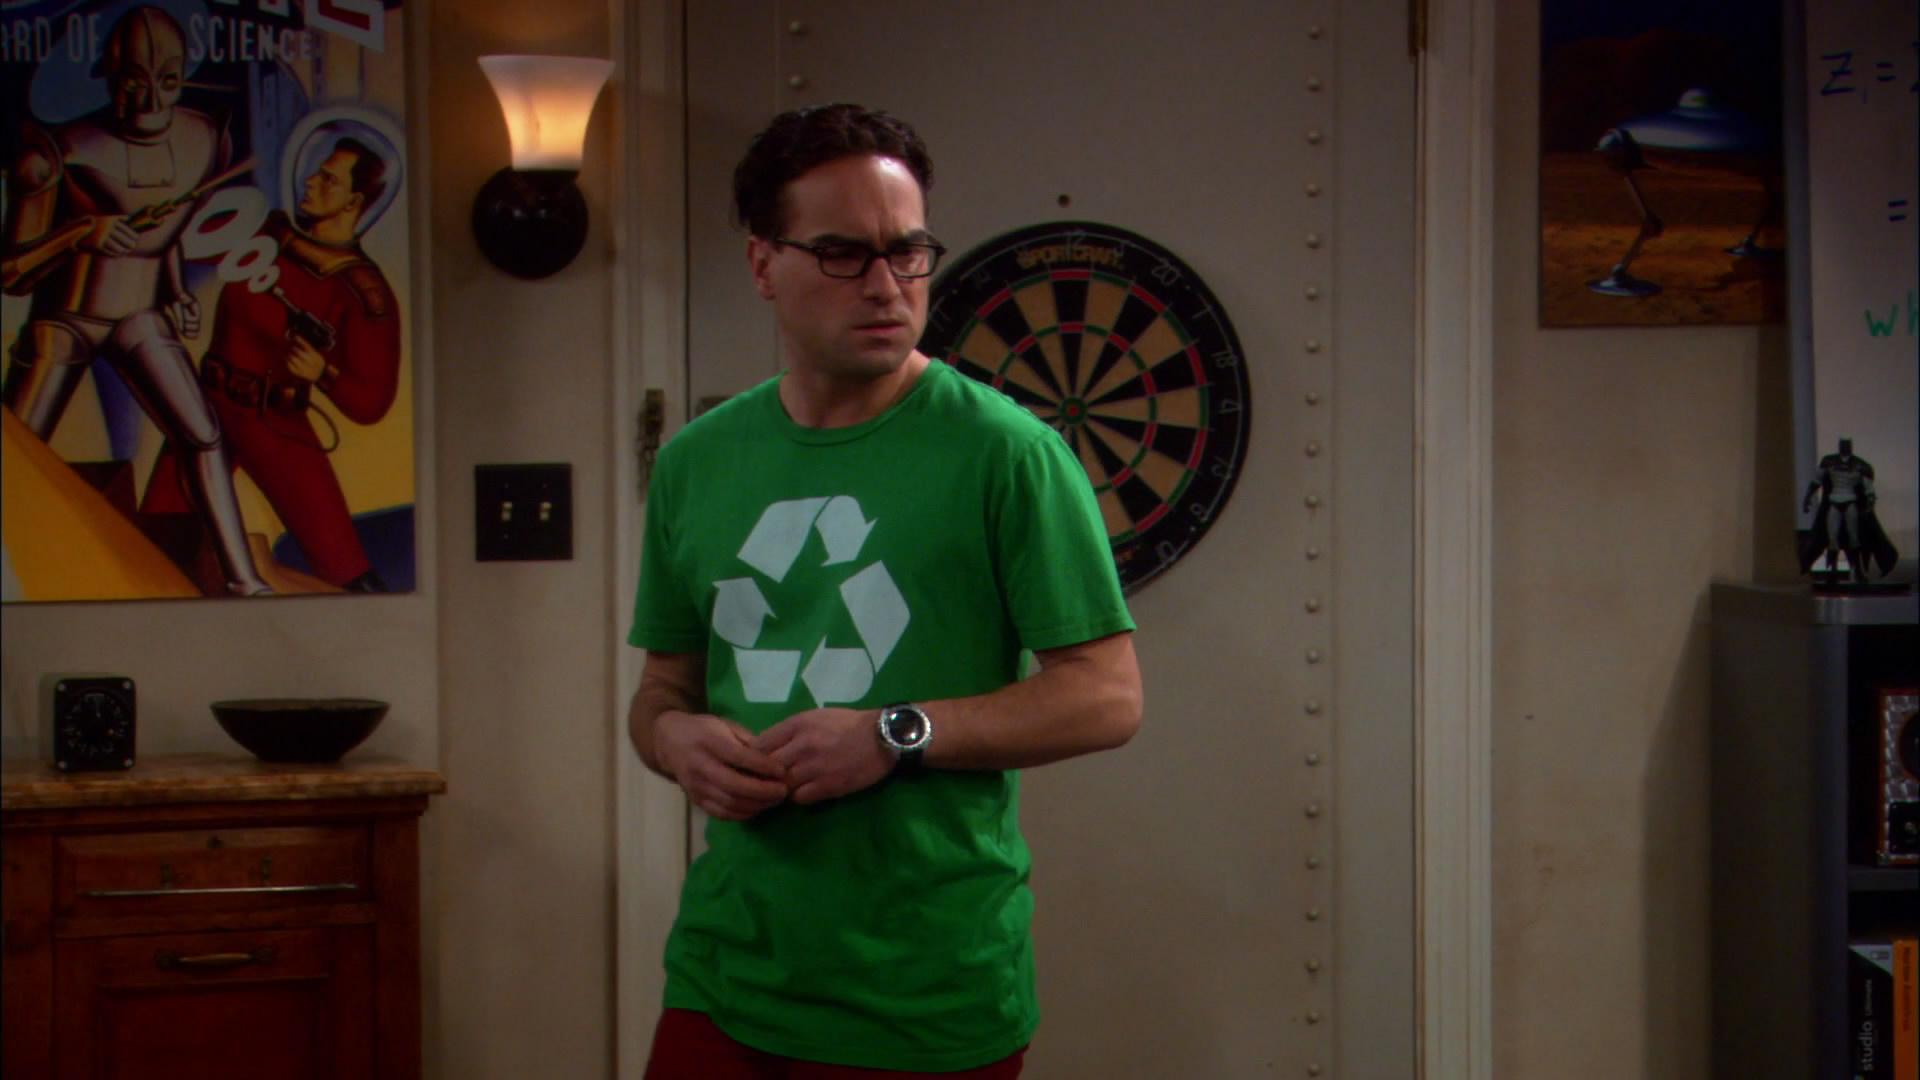 The.Big.Bang.Theory.S02E14.1080p.BluRay.x264-CiNEFiLE.mkv_snapshot_14.04_[2014.12.08_22.07.43].jpg